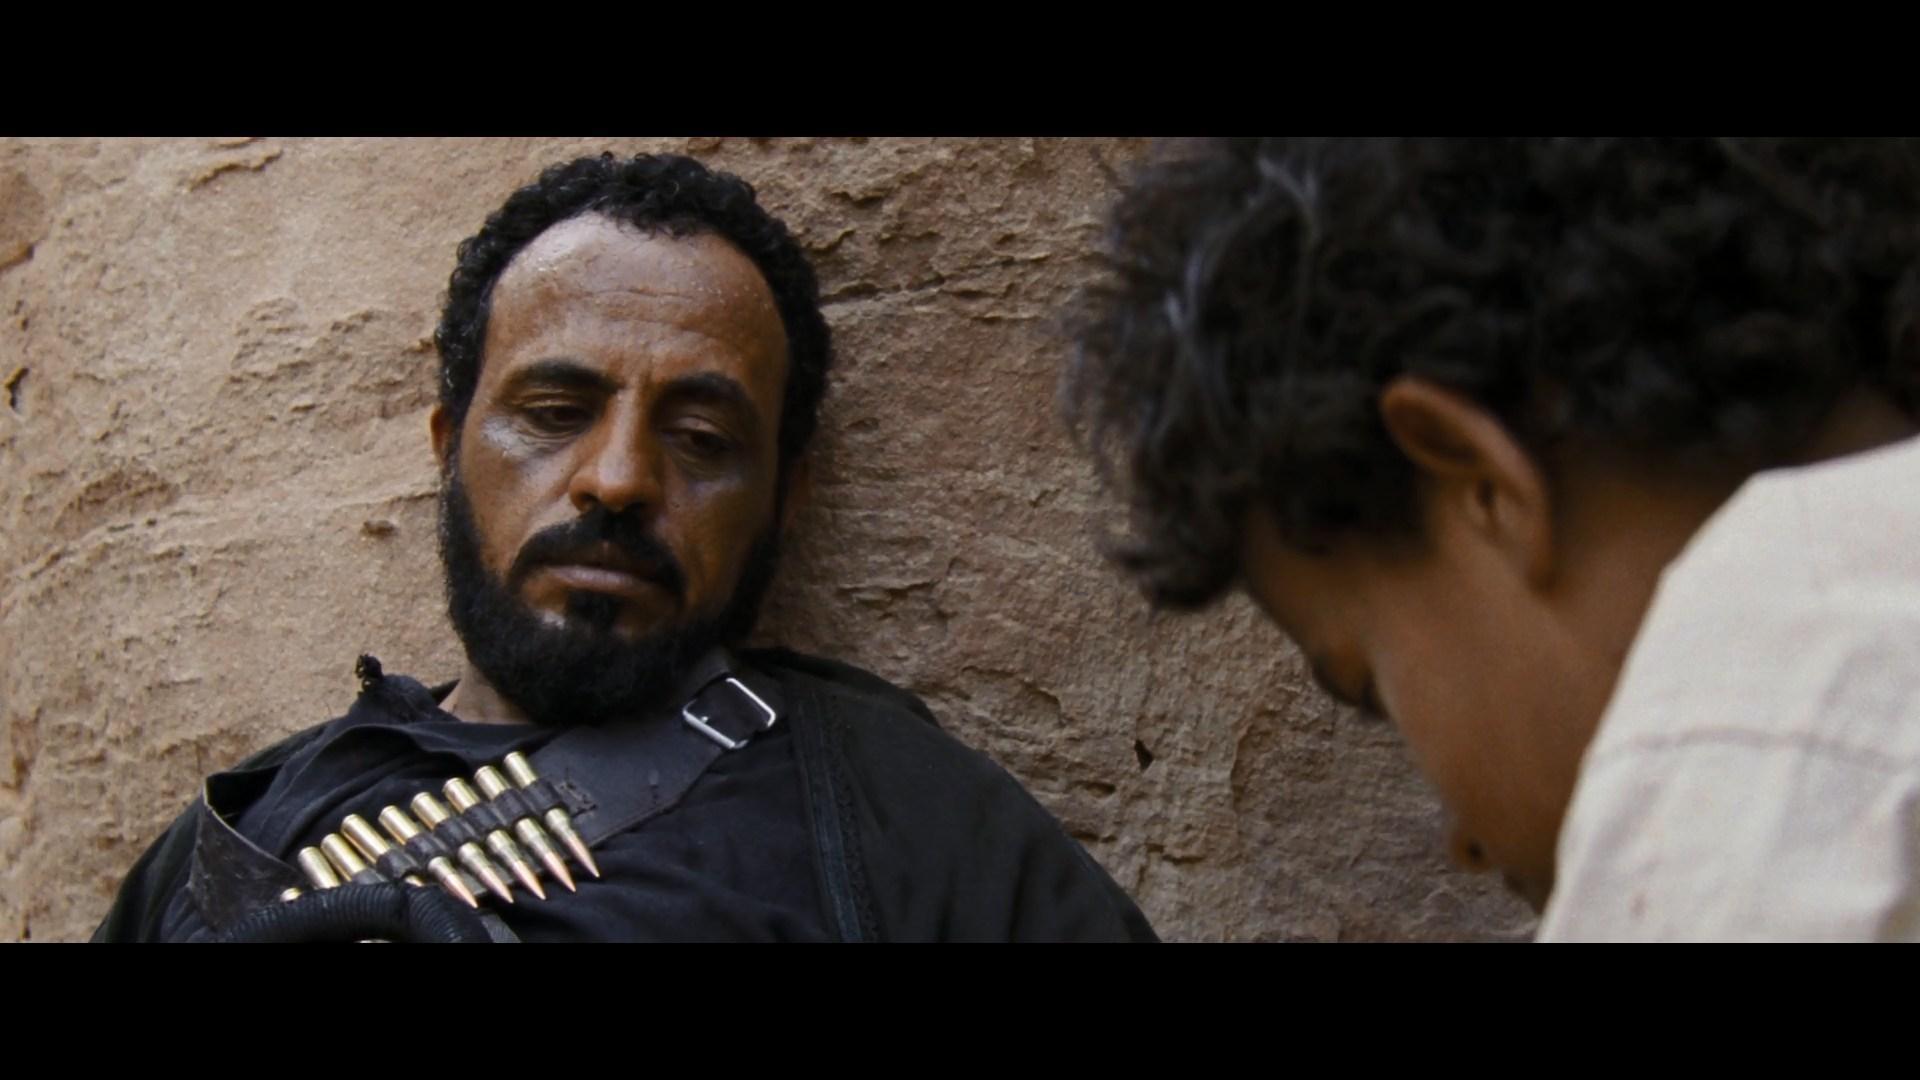 [فيلم][تورنت][تحميل][ذيب][2014][1080p][Web-DL] 7 arabp2p.com